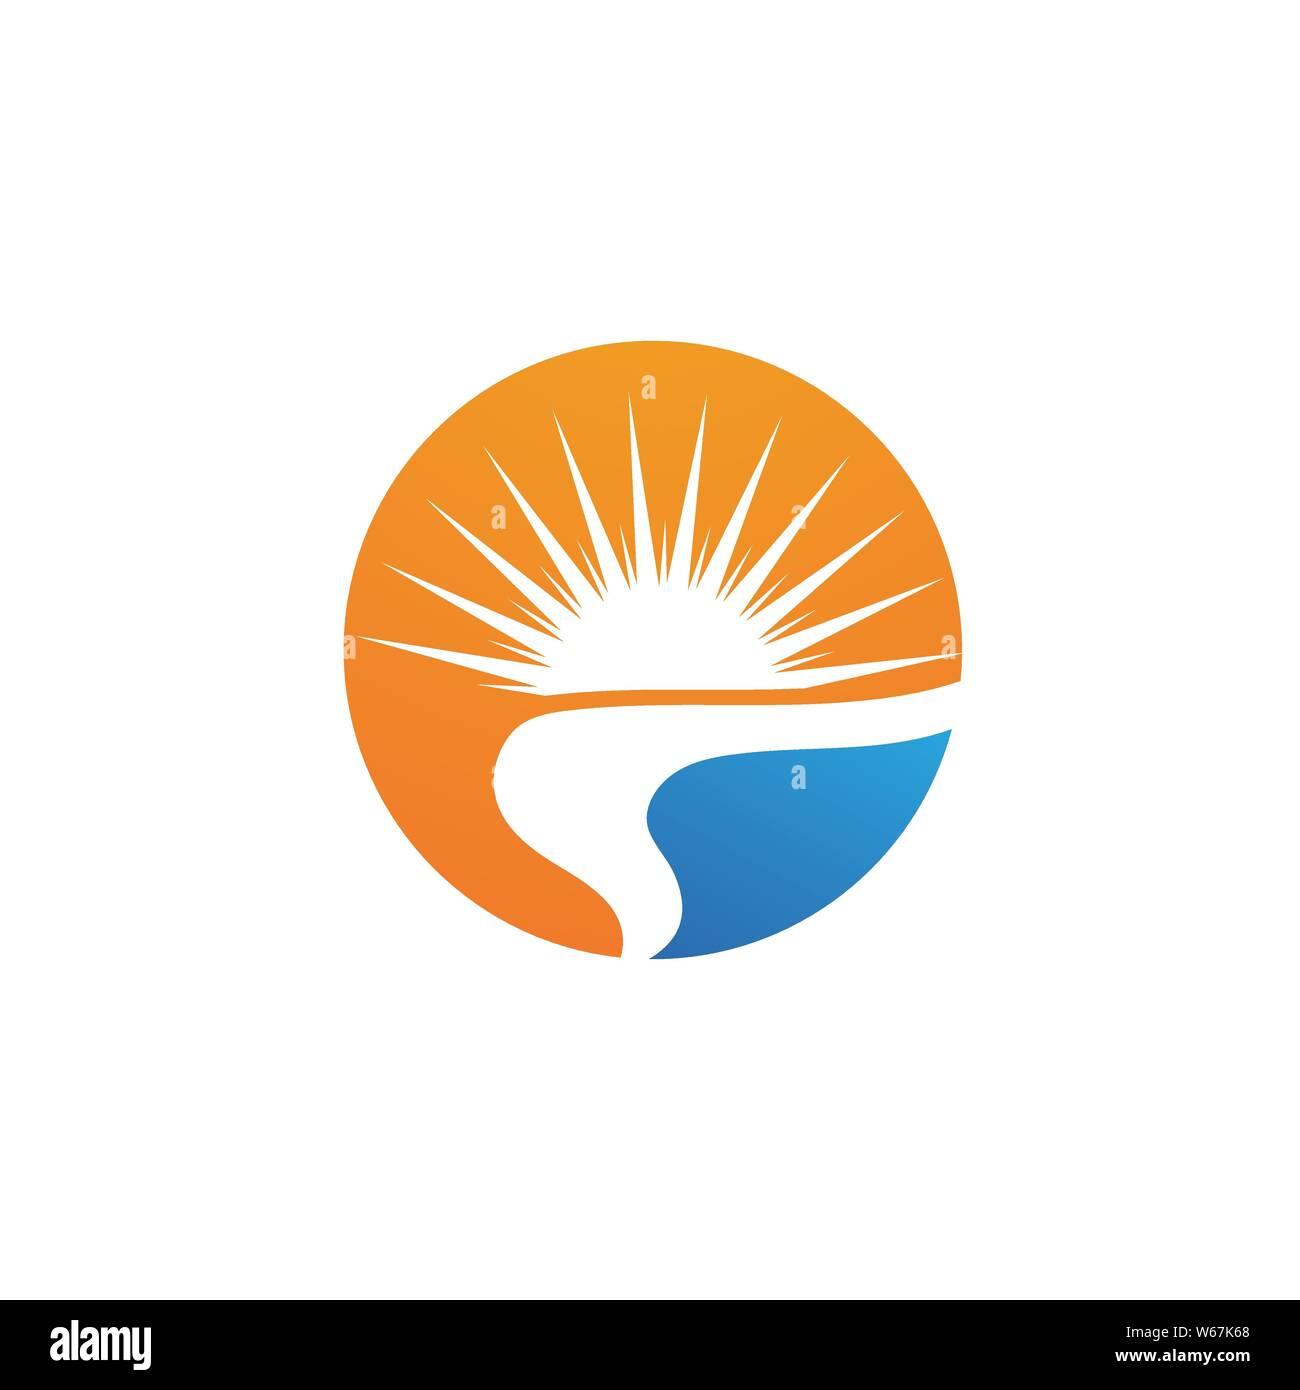 river vector icon illustration design stock vector image art alamy alamy